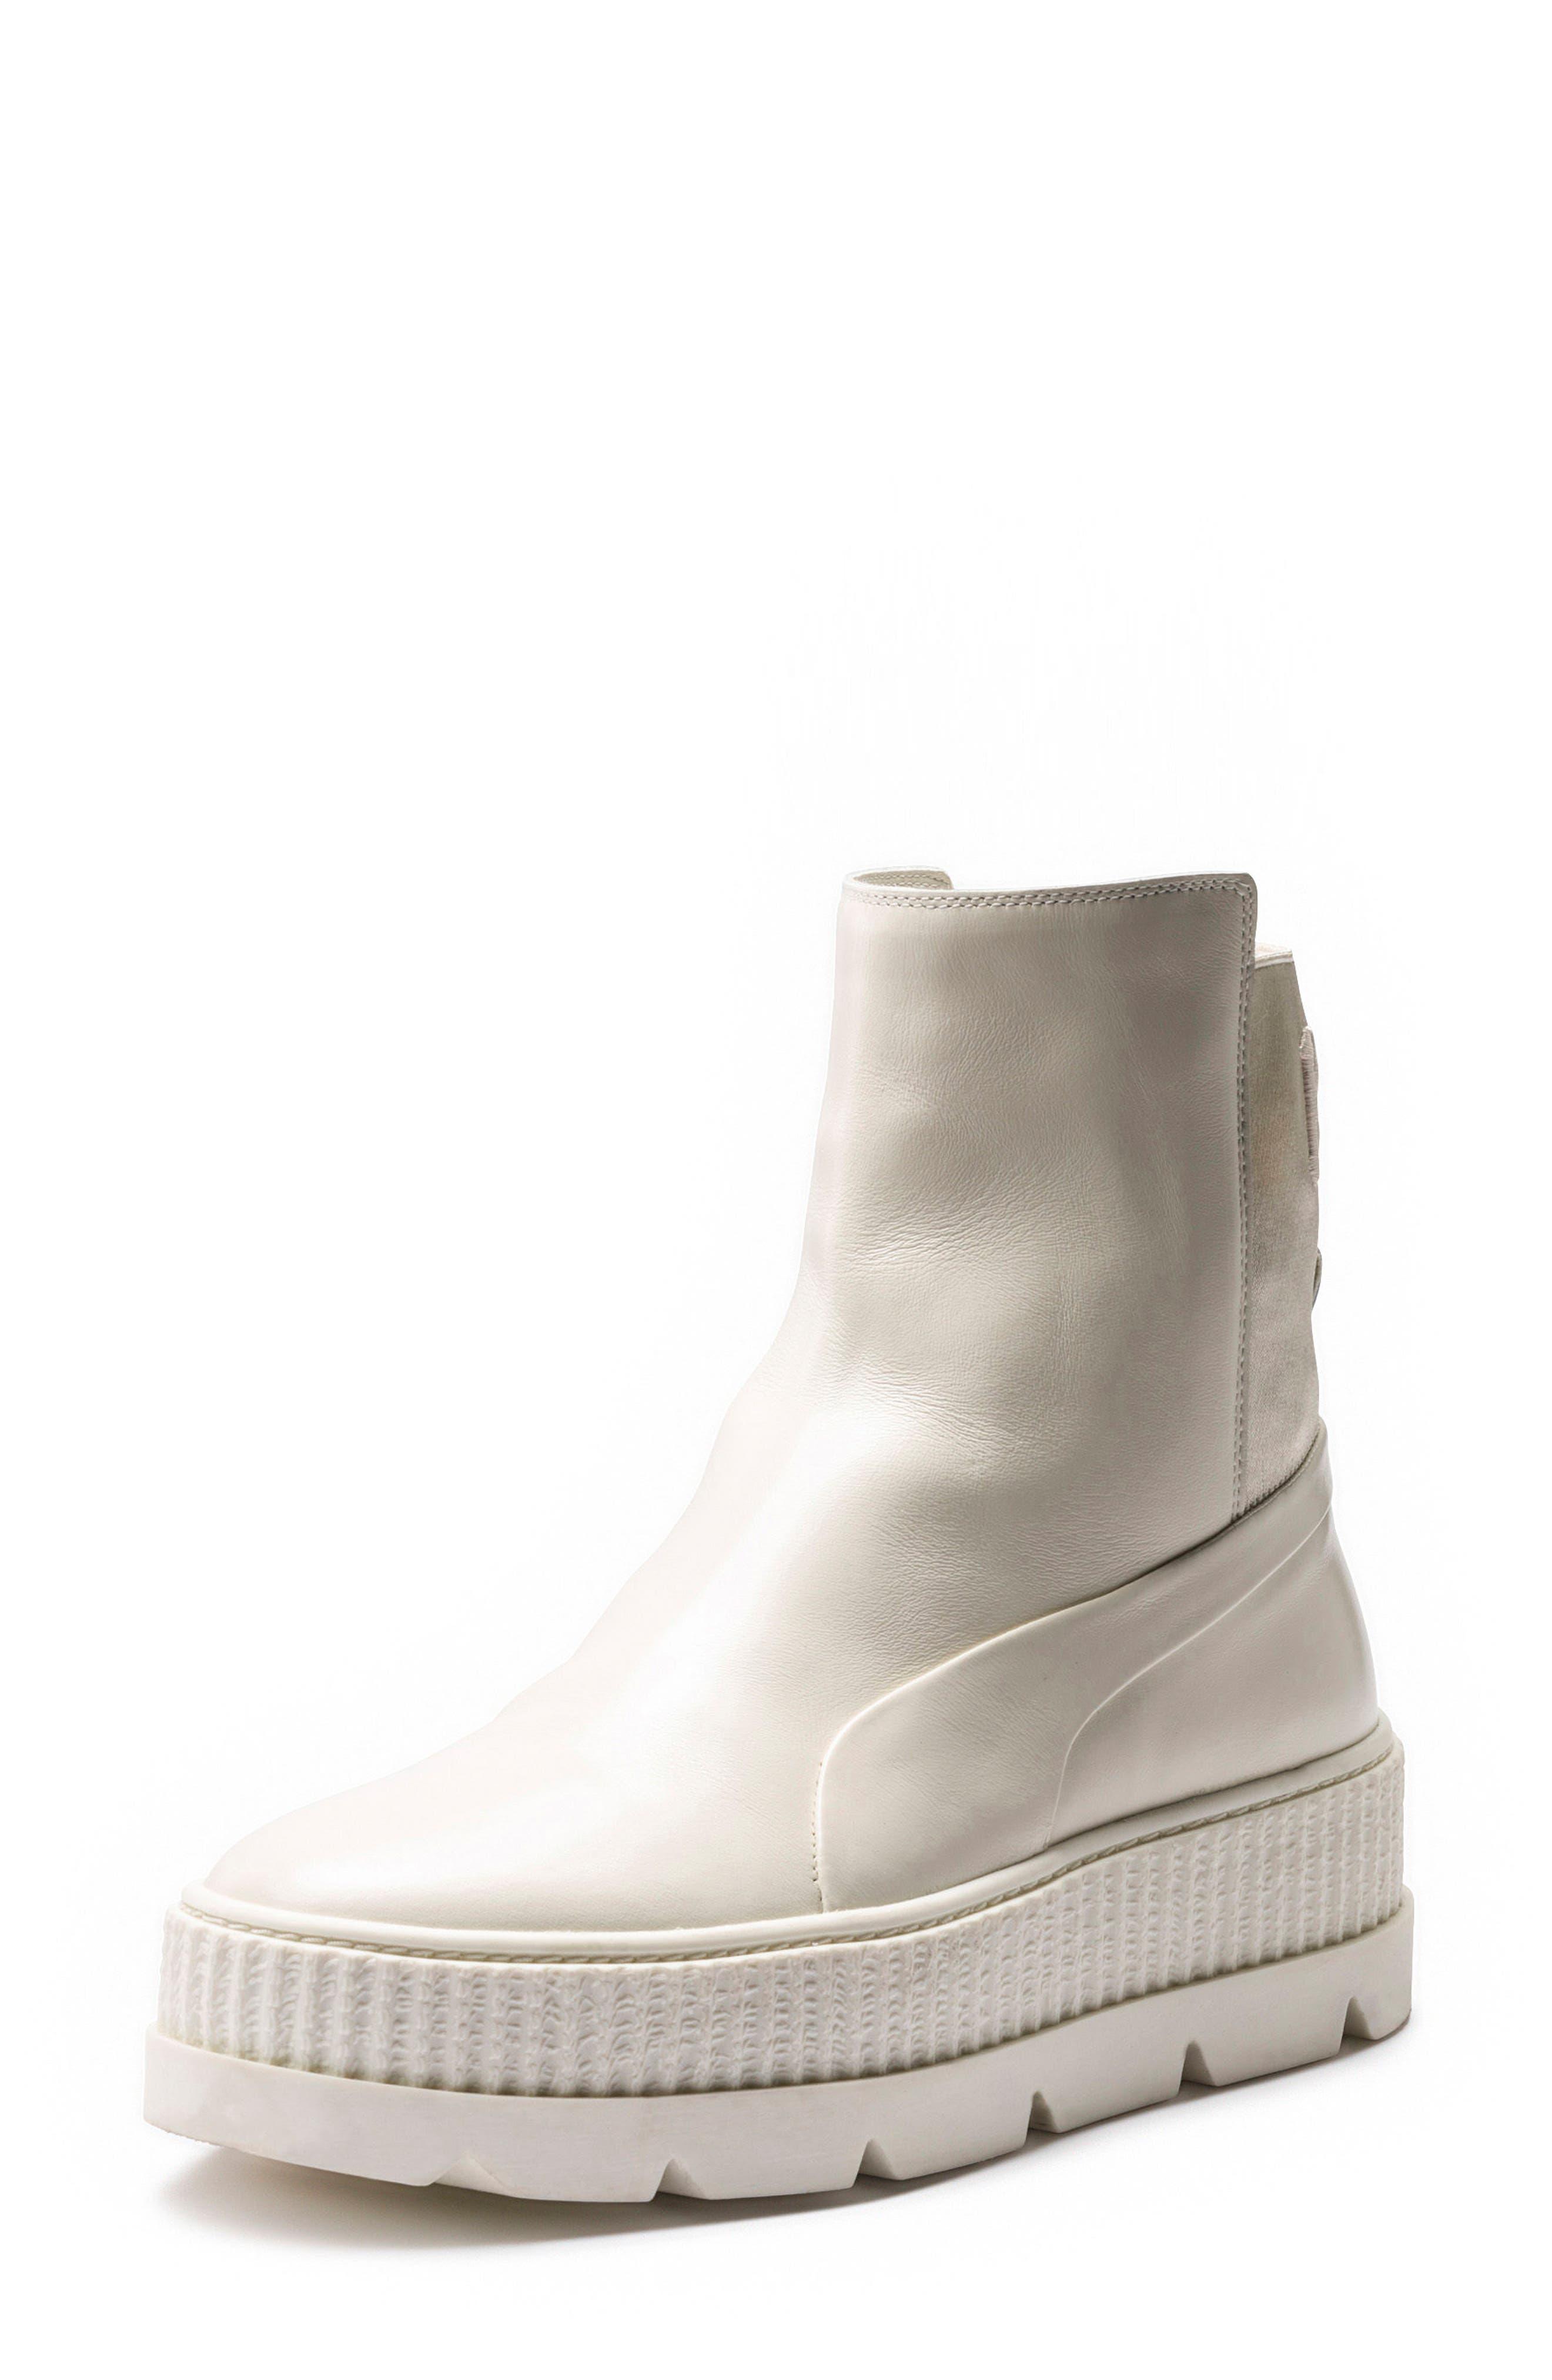 FENTY PUMA by Rihanna Chelsea Boot Creeper Sneaker,                             Main thumbnail 2, color,